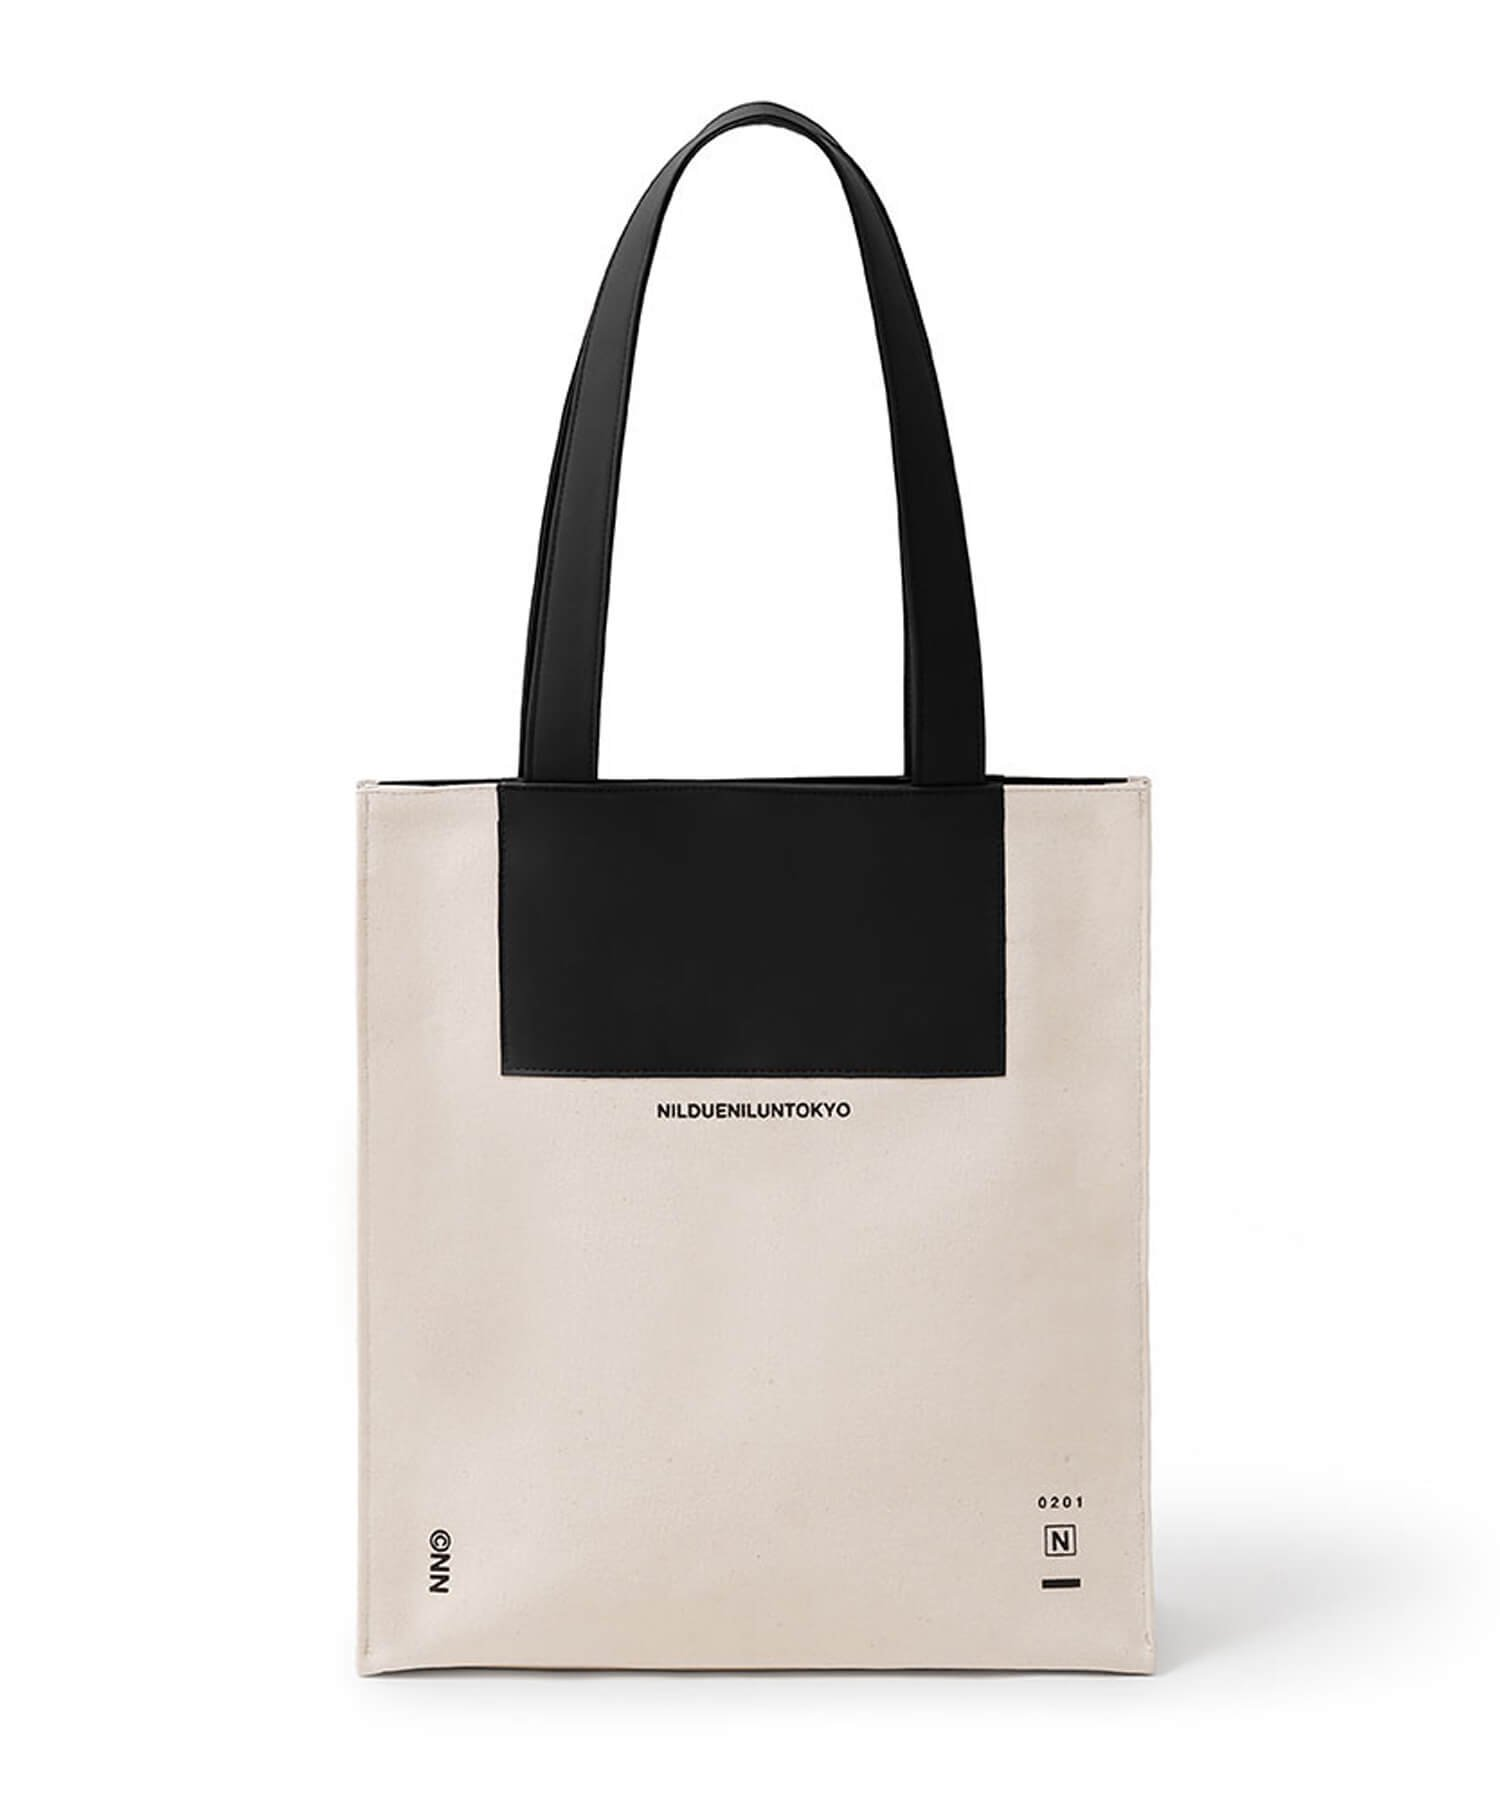 NIL DUE / NIL UN TOKYO / ニル デュエ / ニル アン トーキョー   CANVAS LEATHER TOTE (BLACK) 商品画像1